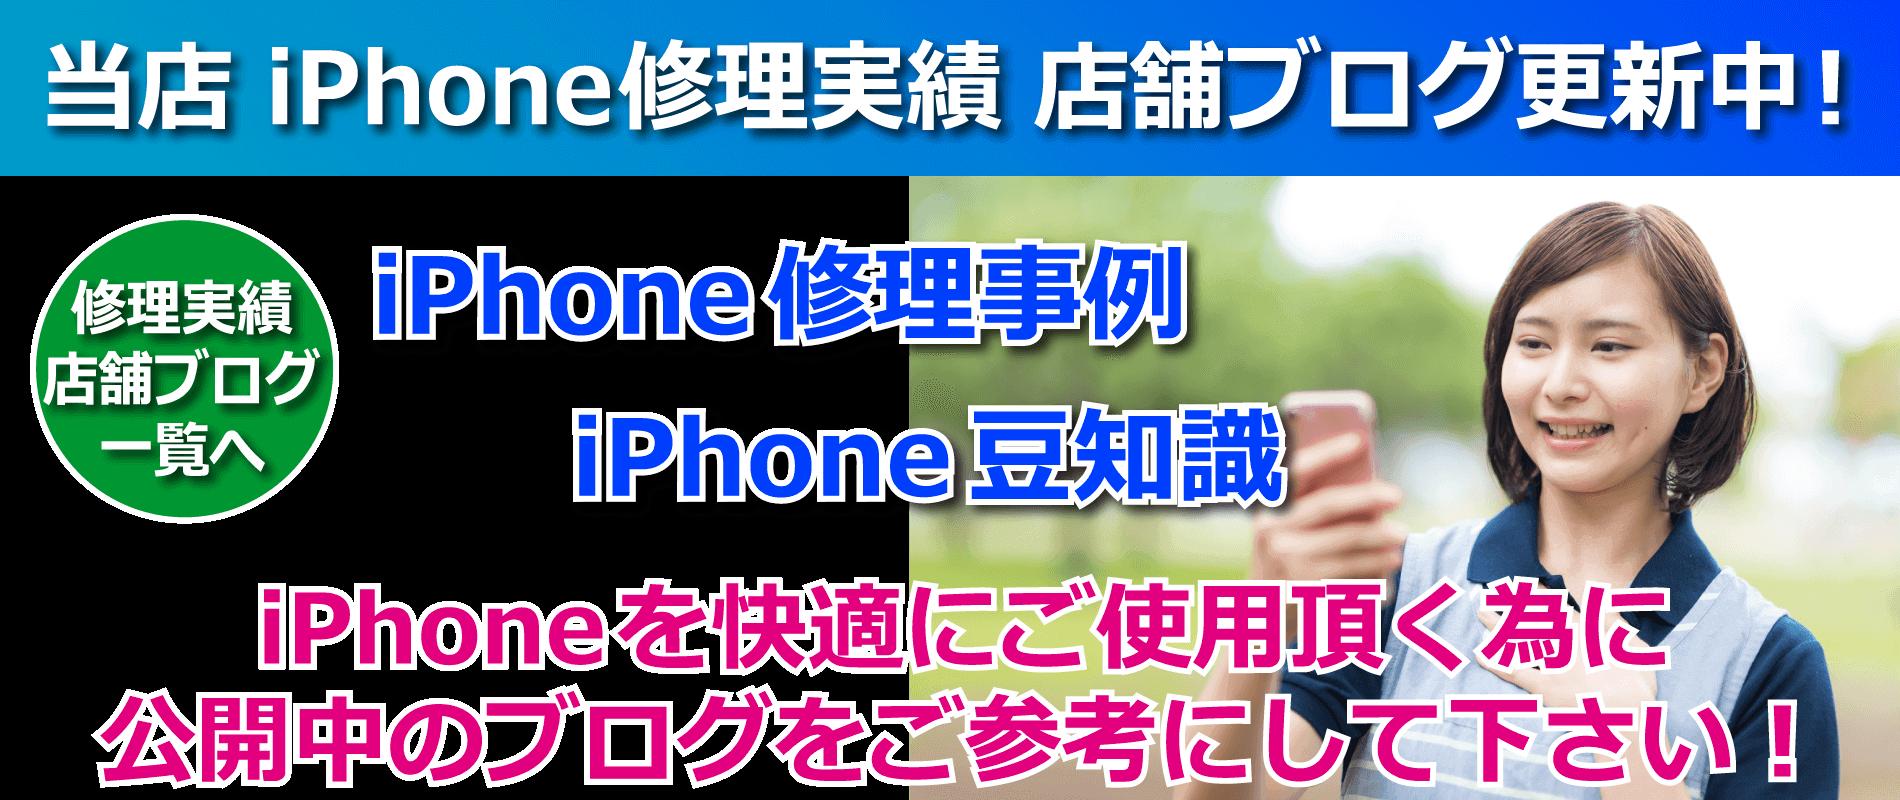 iphone修理実績 店舗ブログ更新中!iPhoneを快適にご使用頂くための方法をご案内中です。